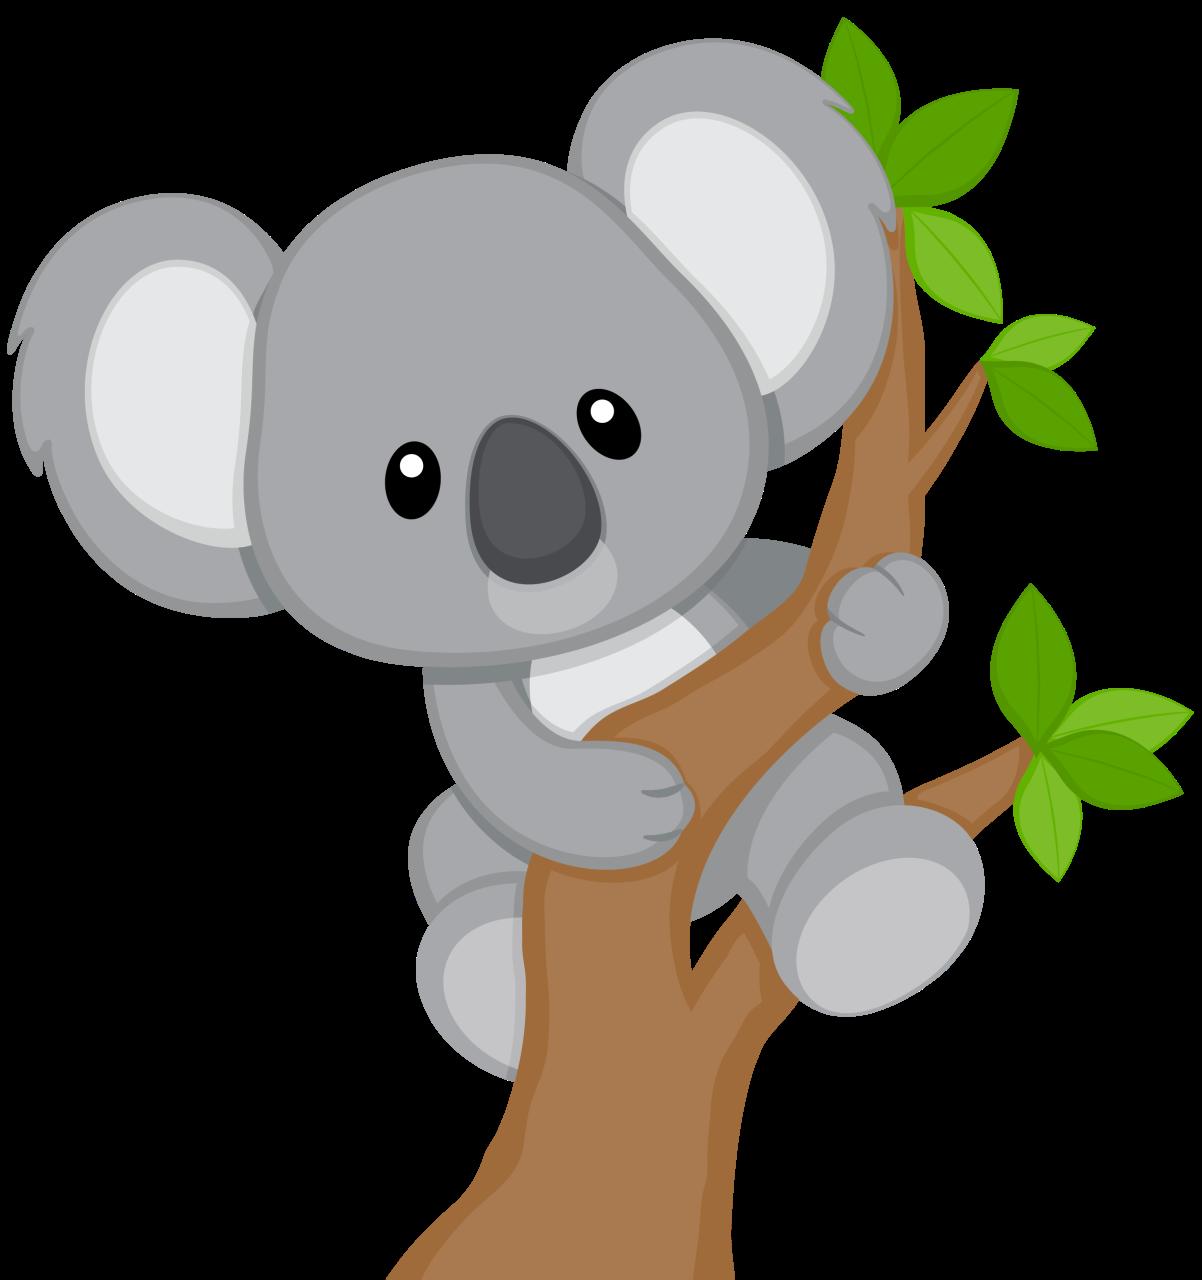 png transparent stock Koala clipart.  df a aabede